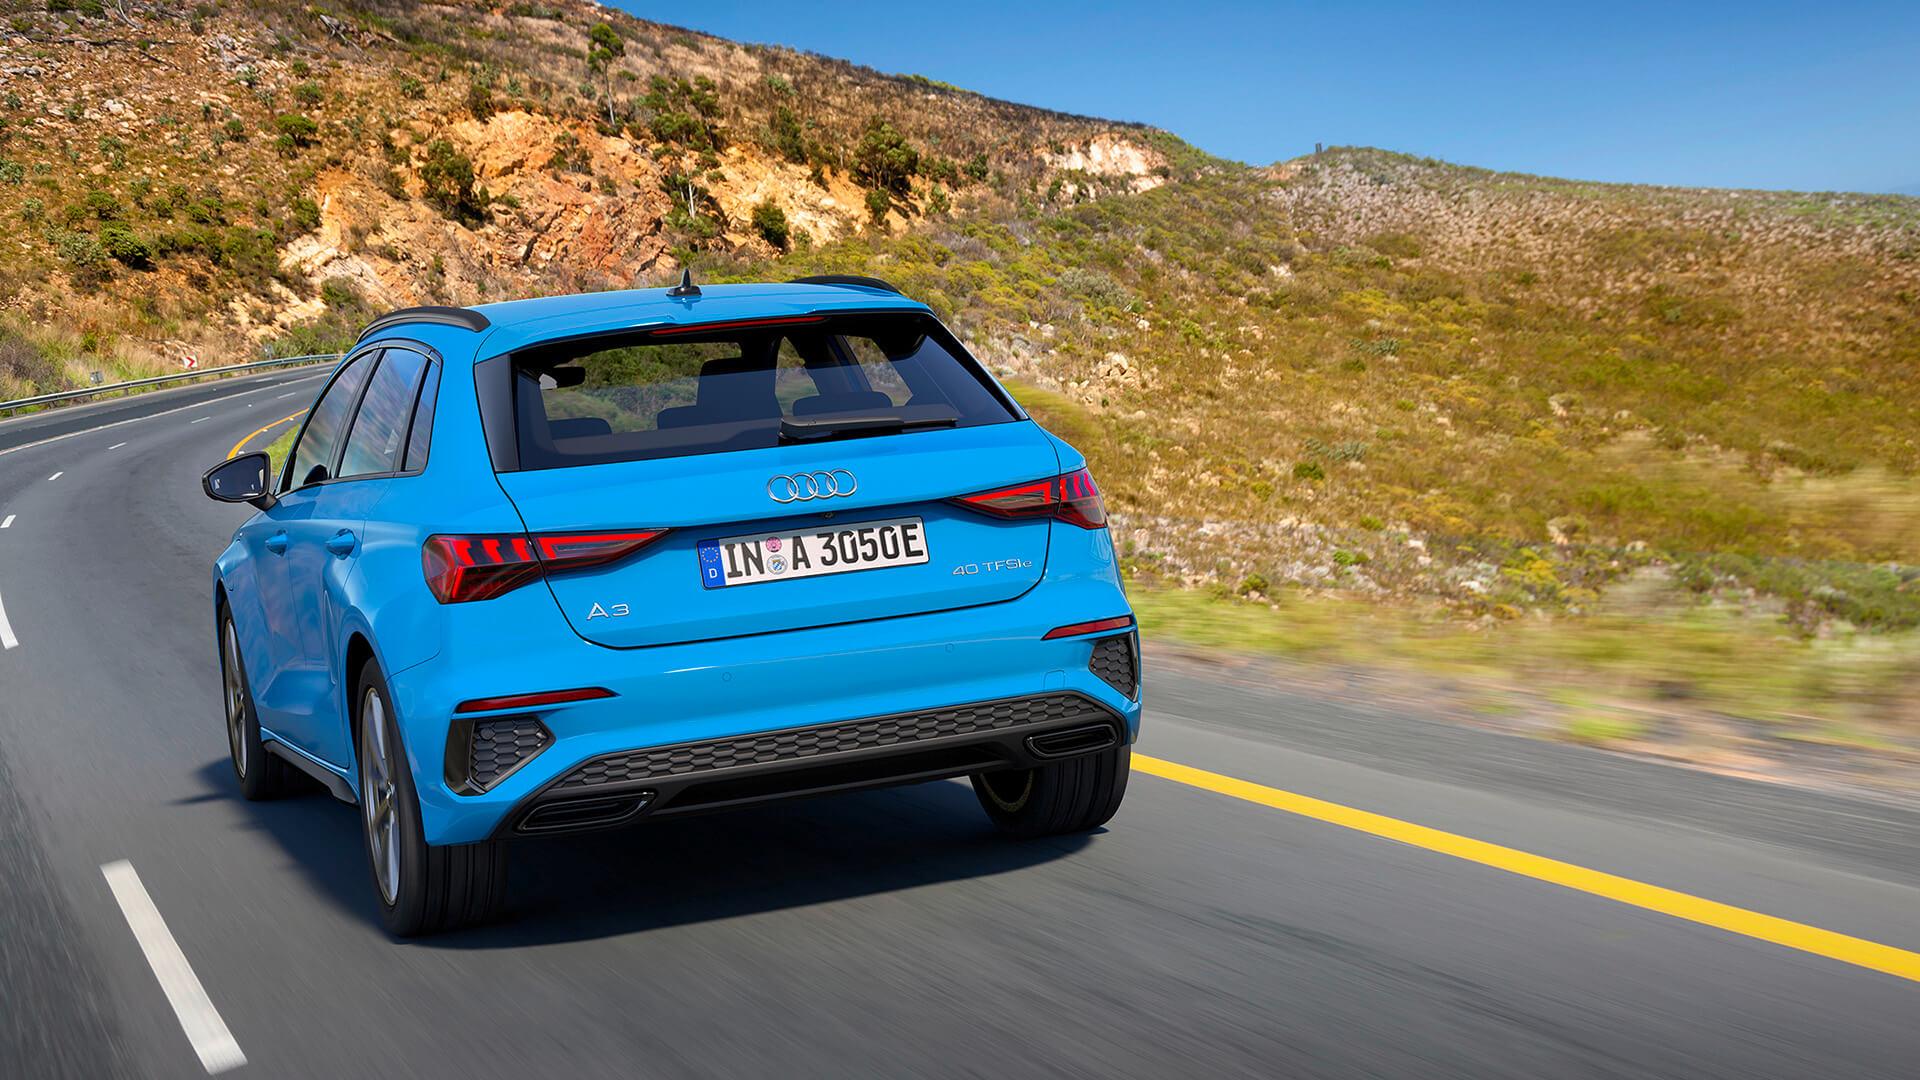 Audi A3 Sportback 40 TFSI e - Πίσω όψη, λήψη σε κίνηση